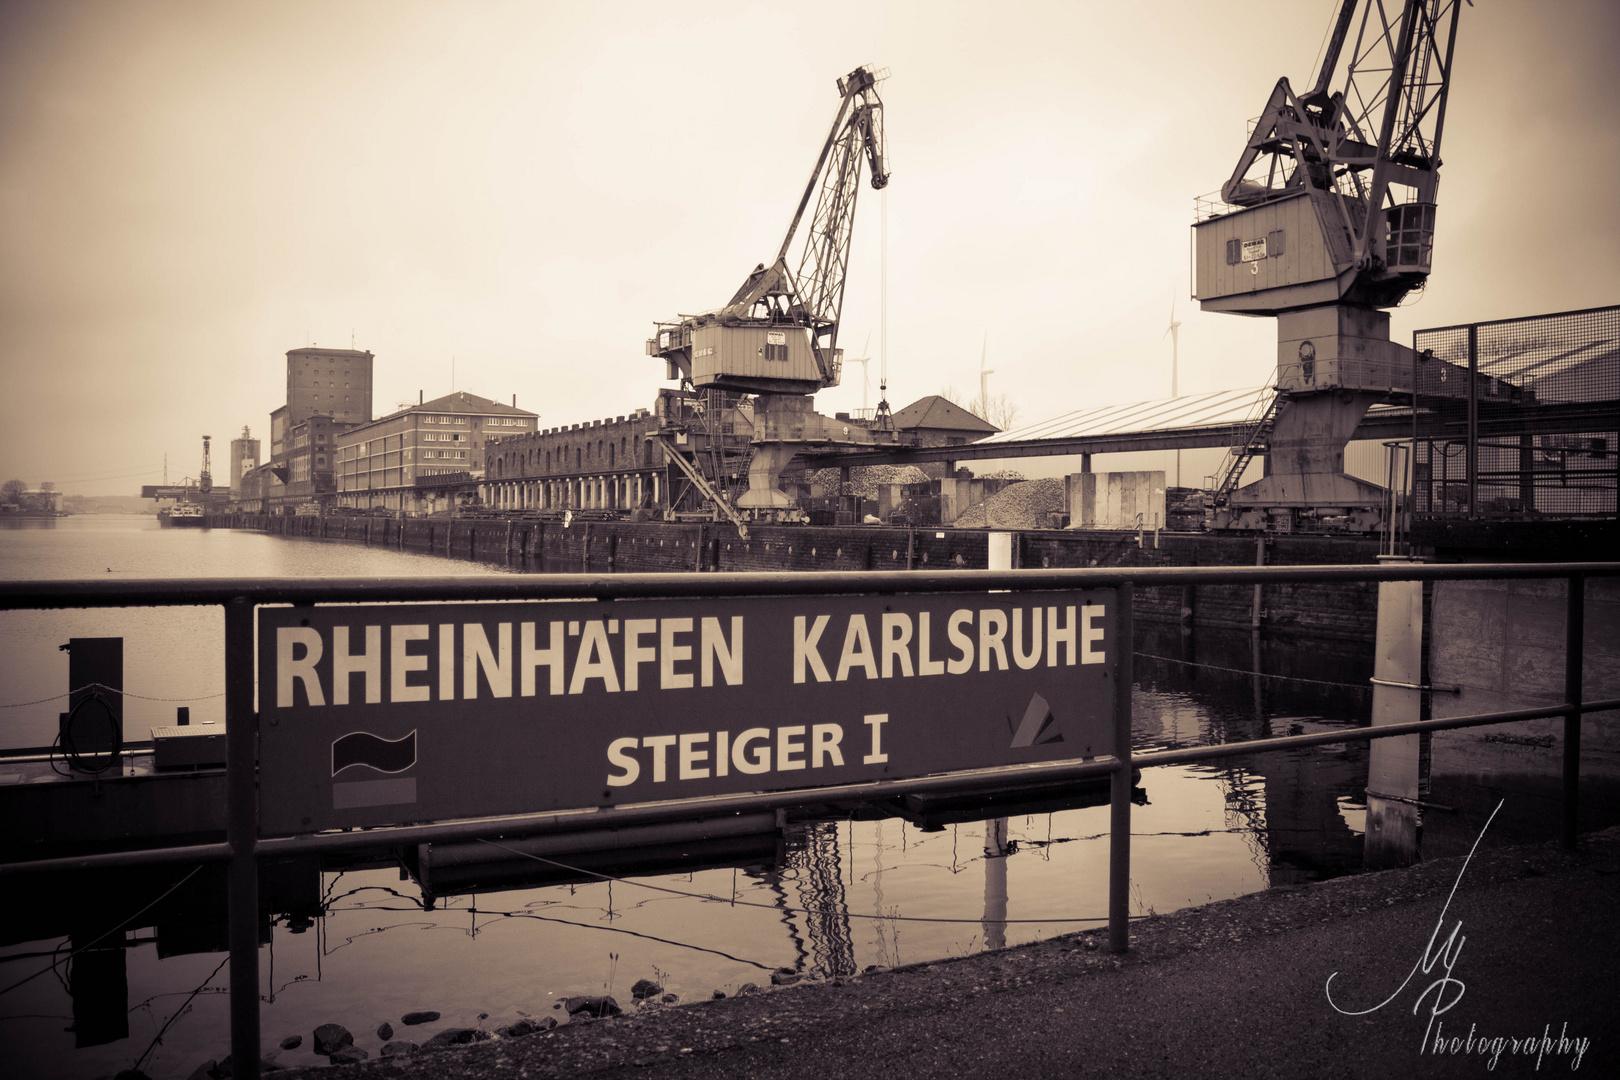 Reinhafen Karlsruhe